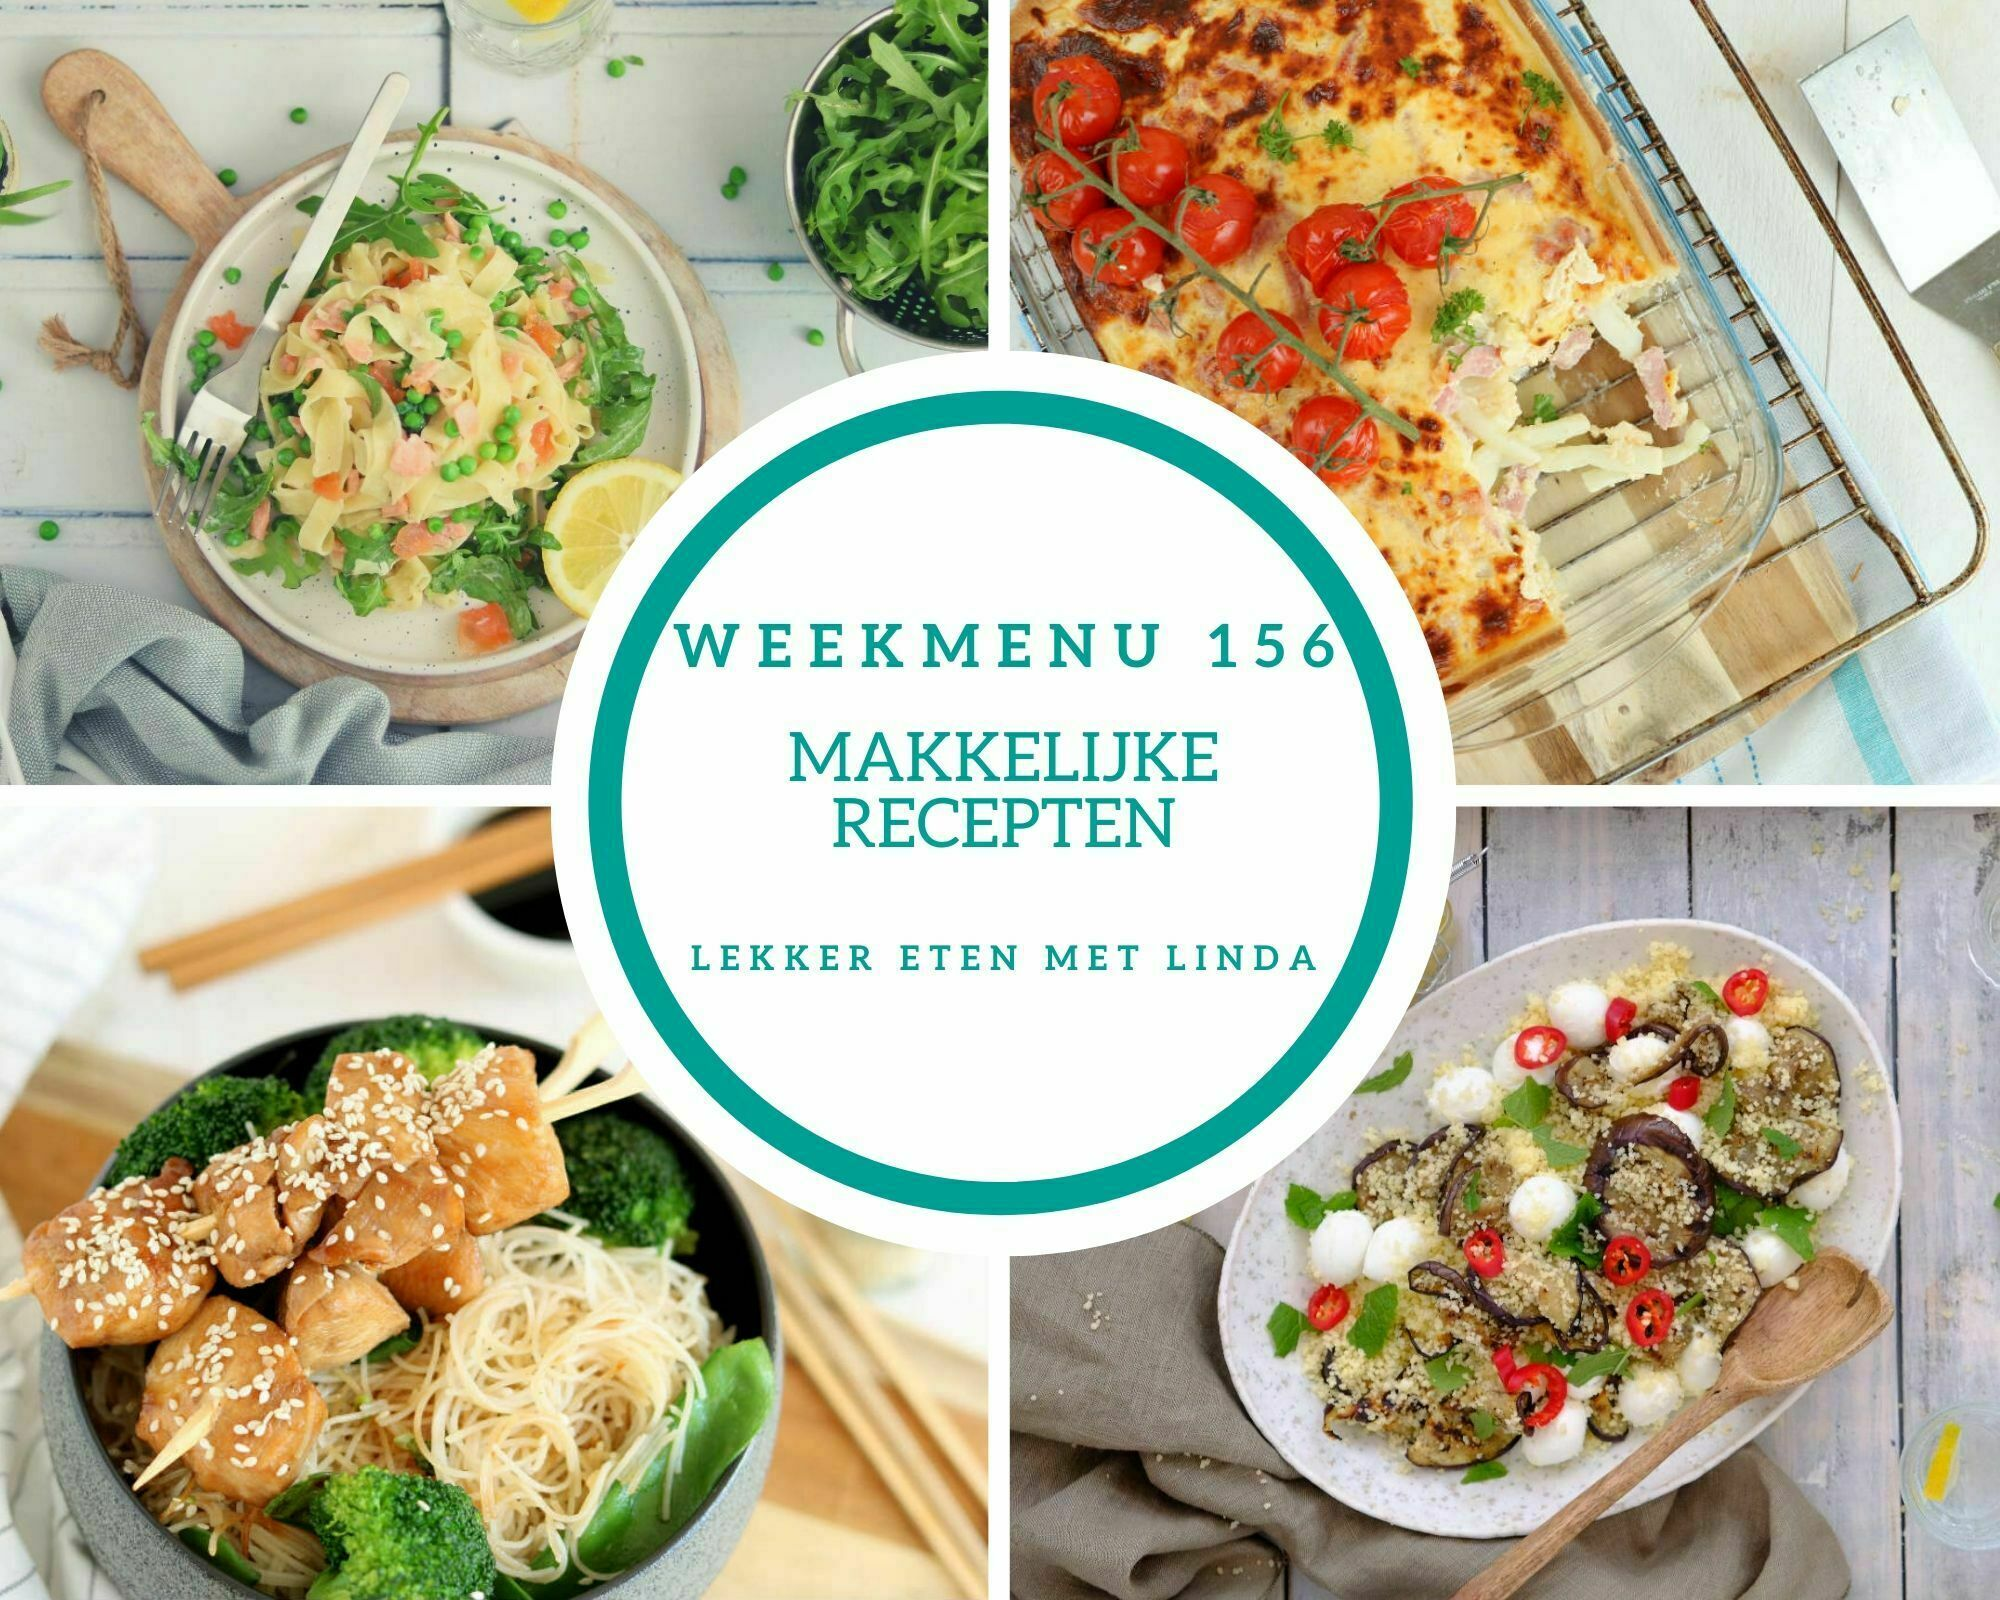 Weekmenu 156 makkelijke recepten